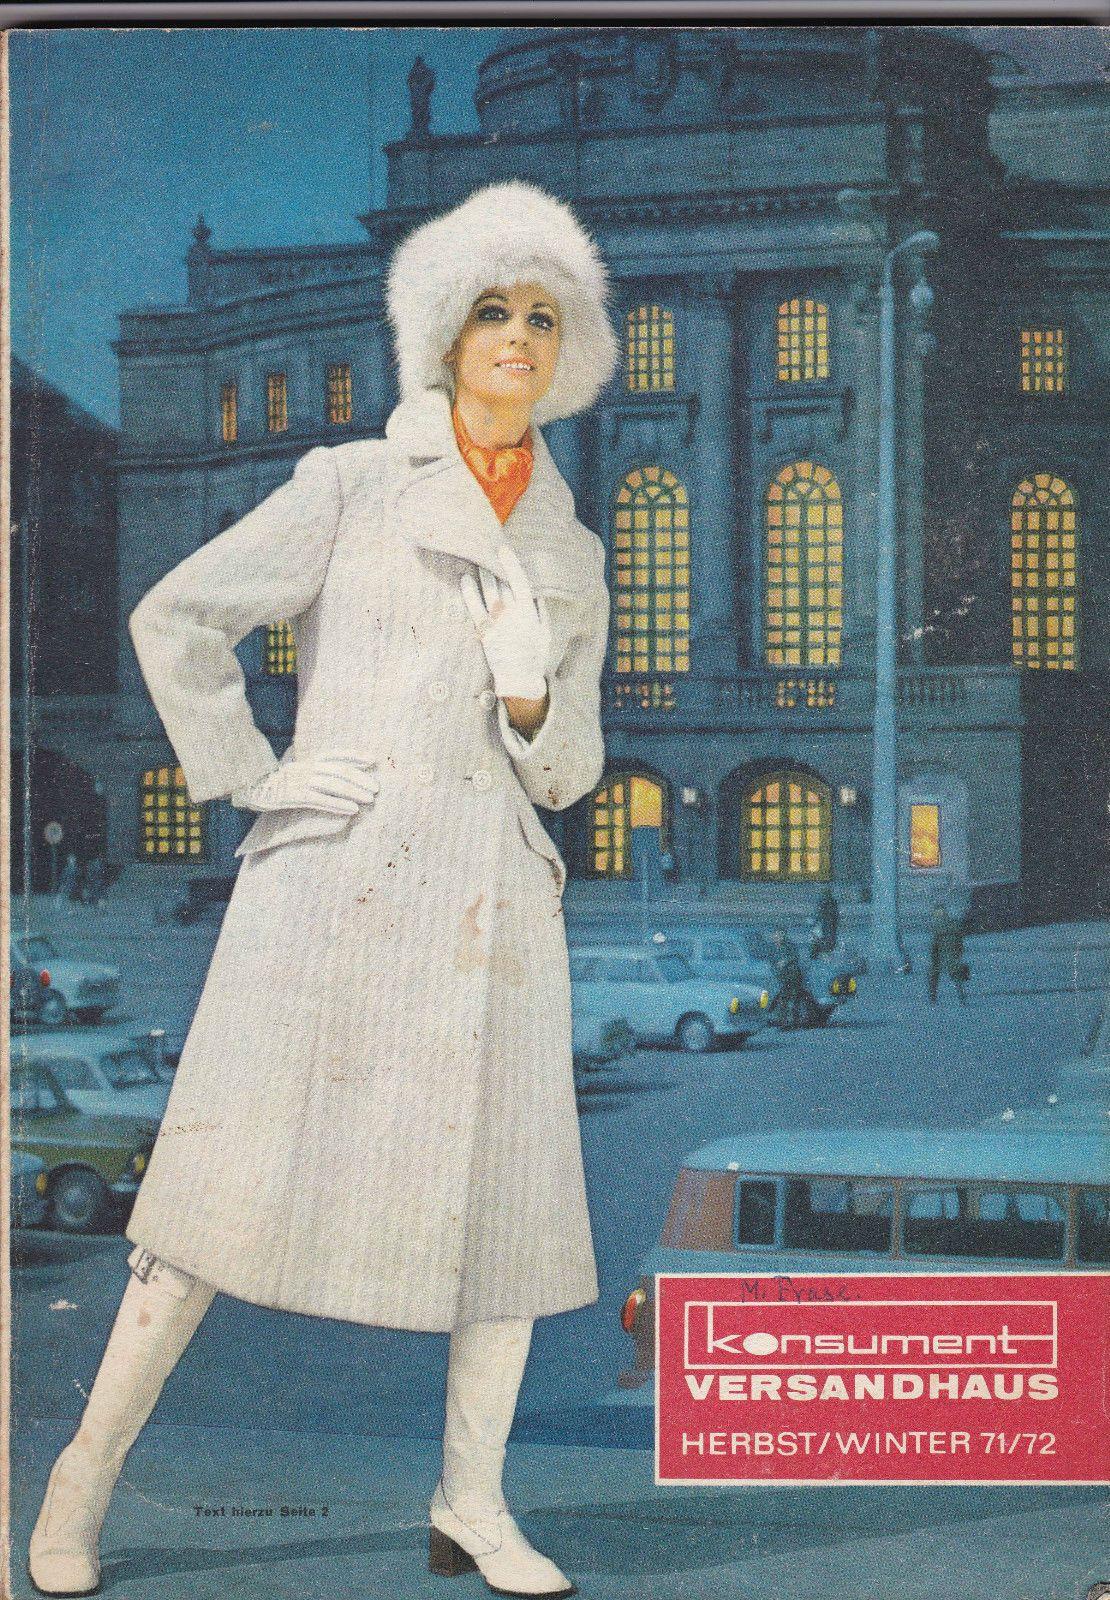 9f517ee4df73b1 KONSUMENT Versandhaus Katalog - (Karl-Marx-Stadt) #DDR-  Herbst/Winterkatalog von 1971/72 ---- KONSUMENT mail order catalog -  fall/winter season 1971/72 ...